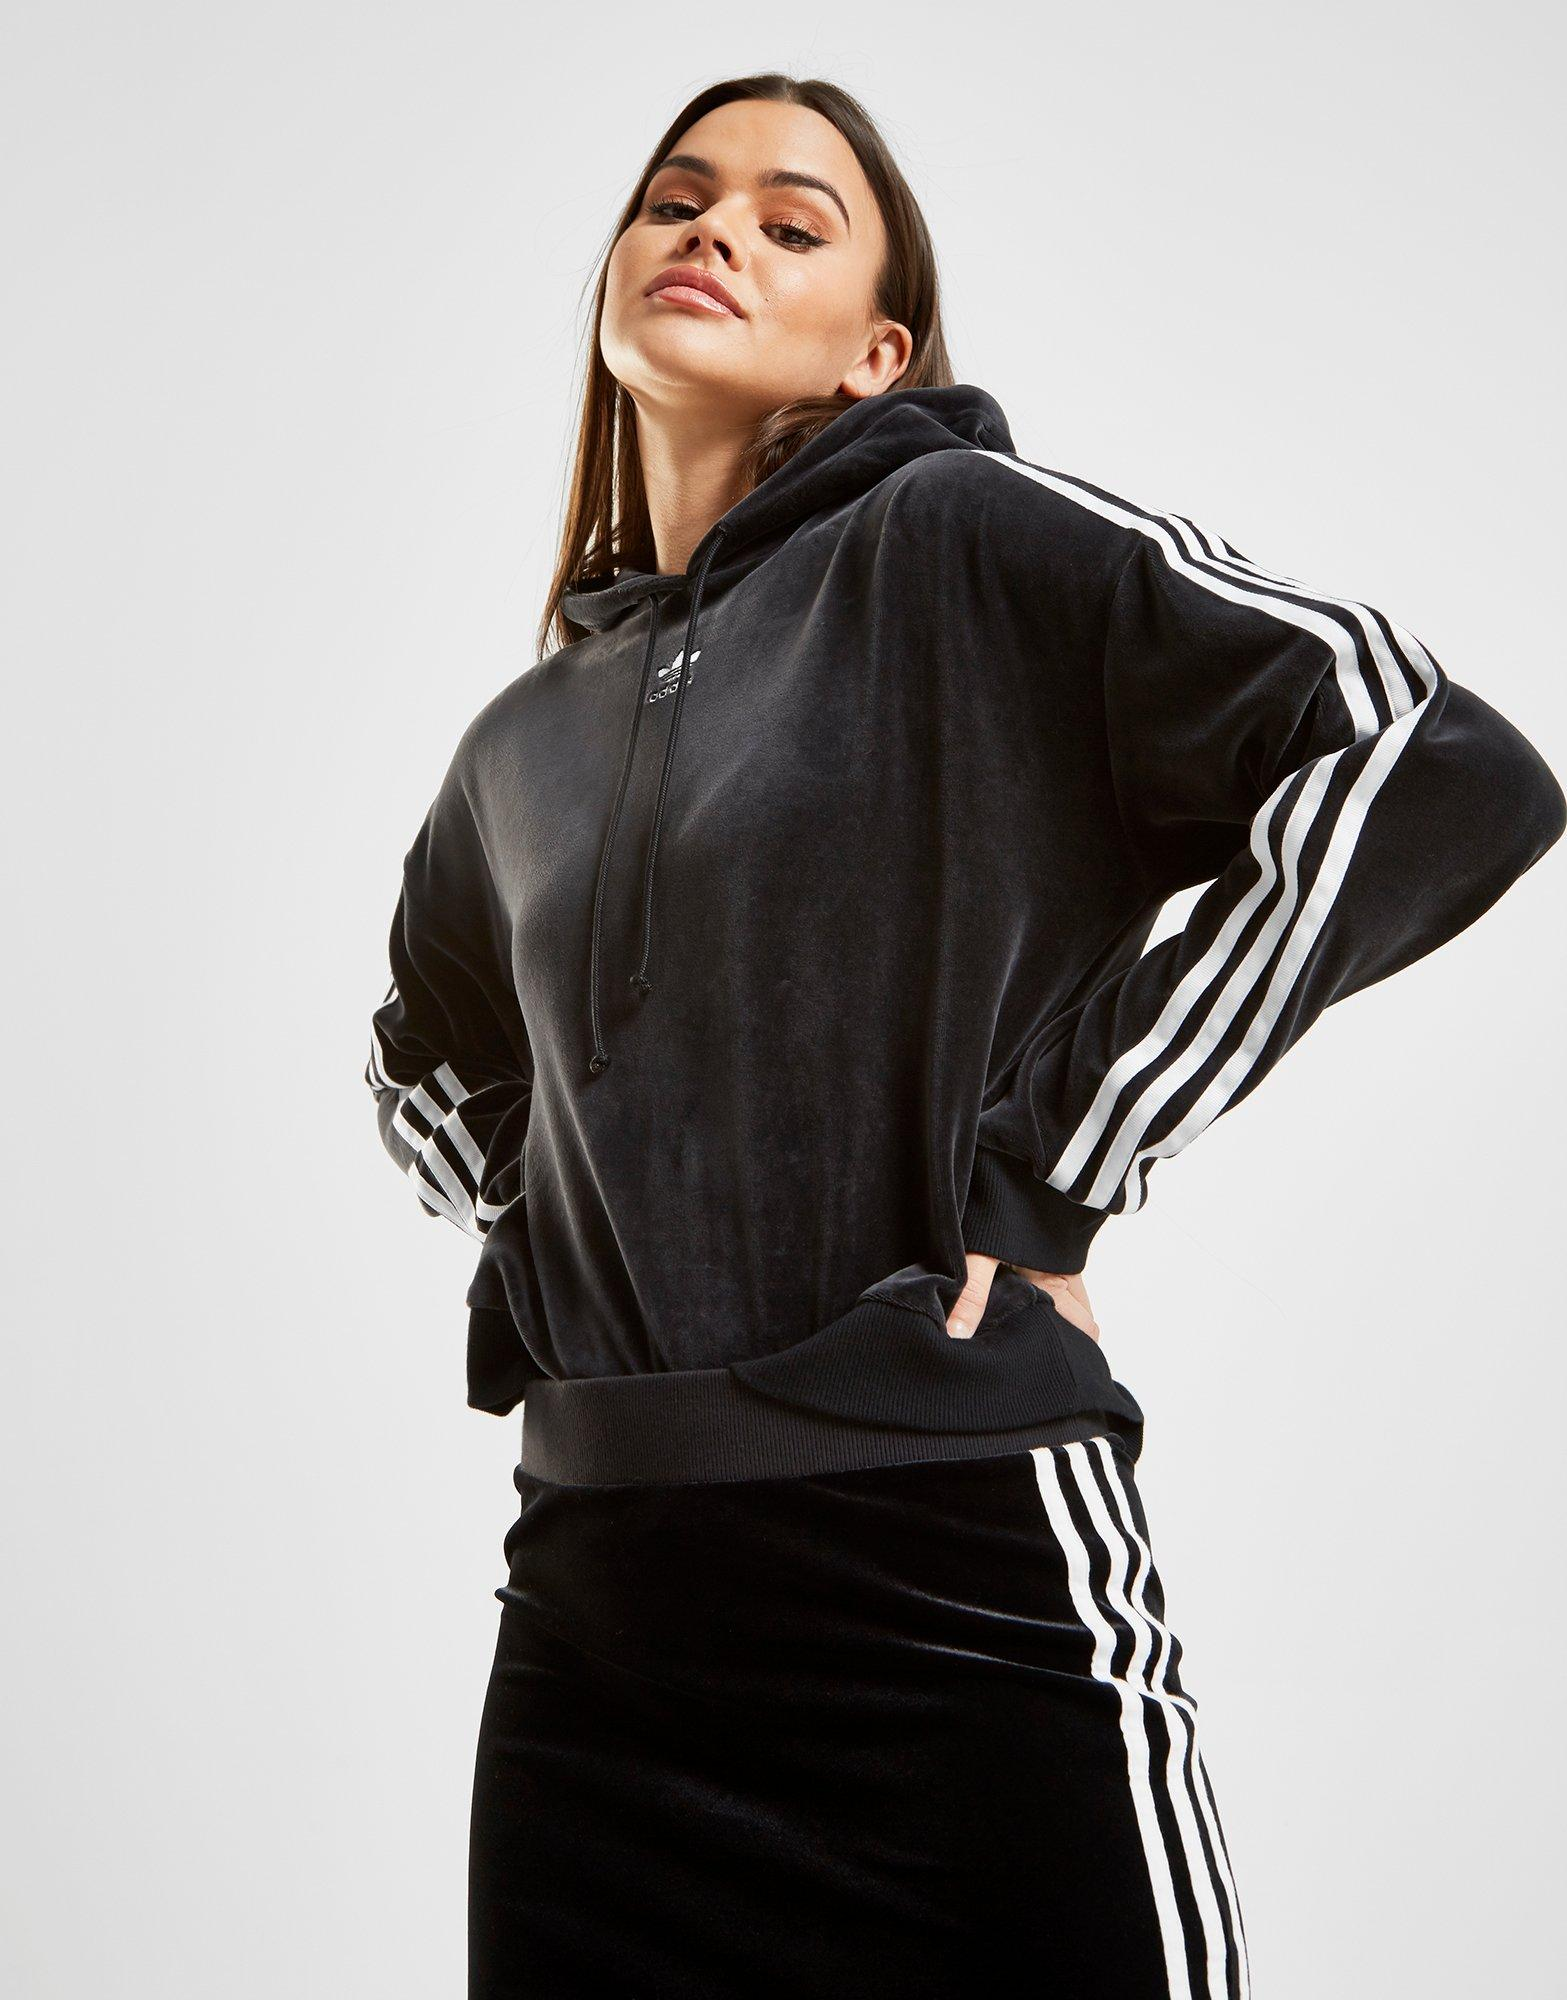 Overhead Originals Crop Stripes About 3 Hoodie Adidas Women's Details Black New Velvet T1FlcKJ